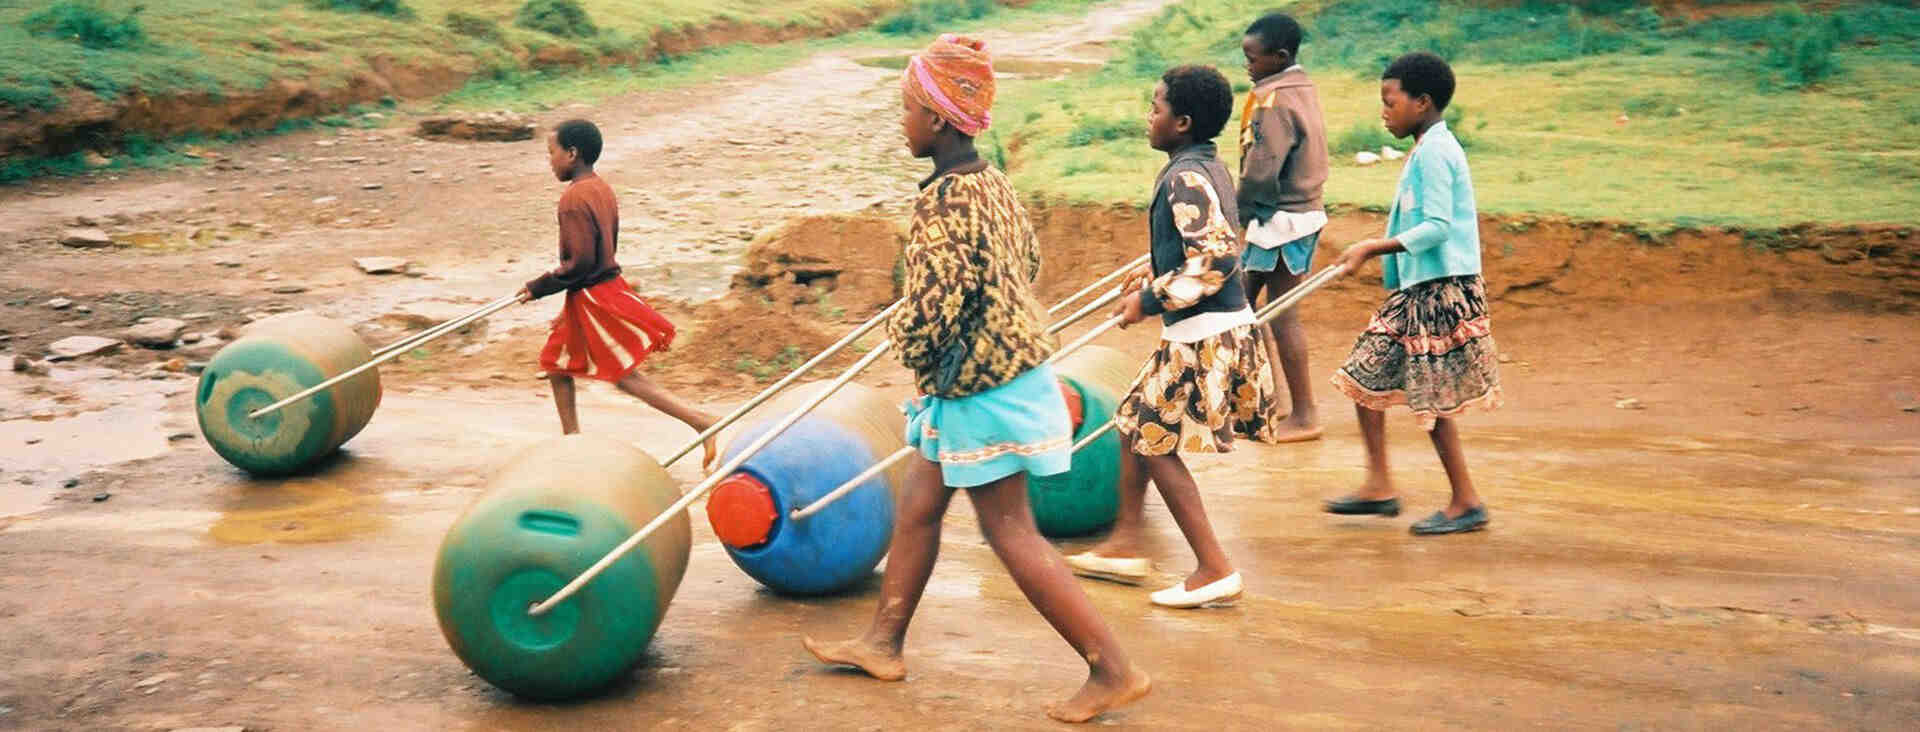 kids-hippo-rollers-slide